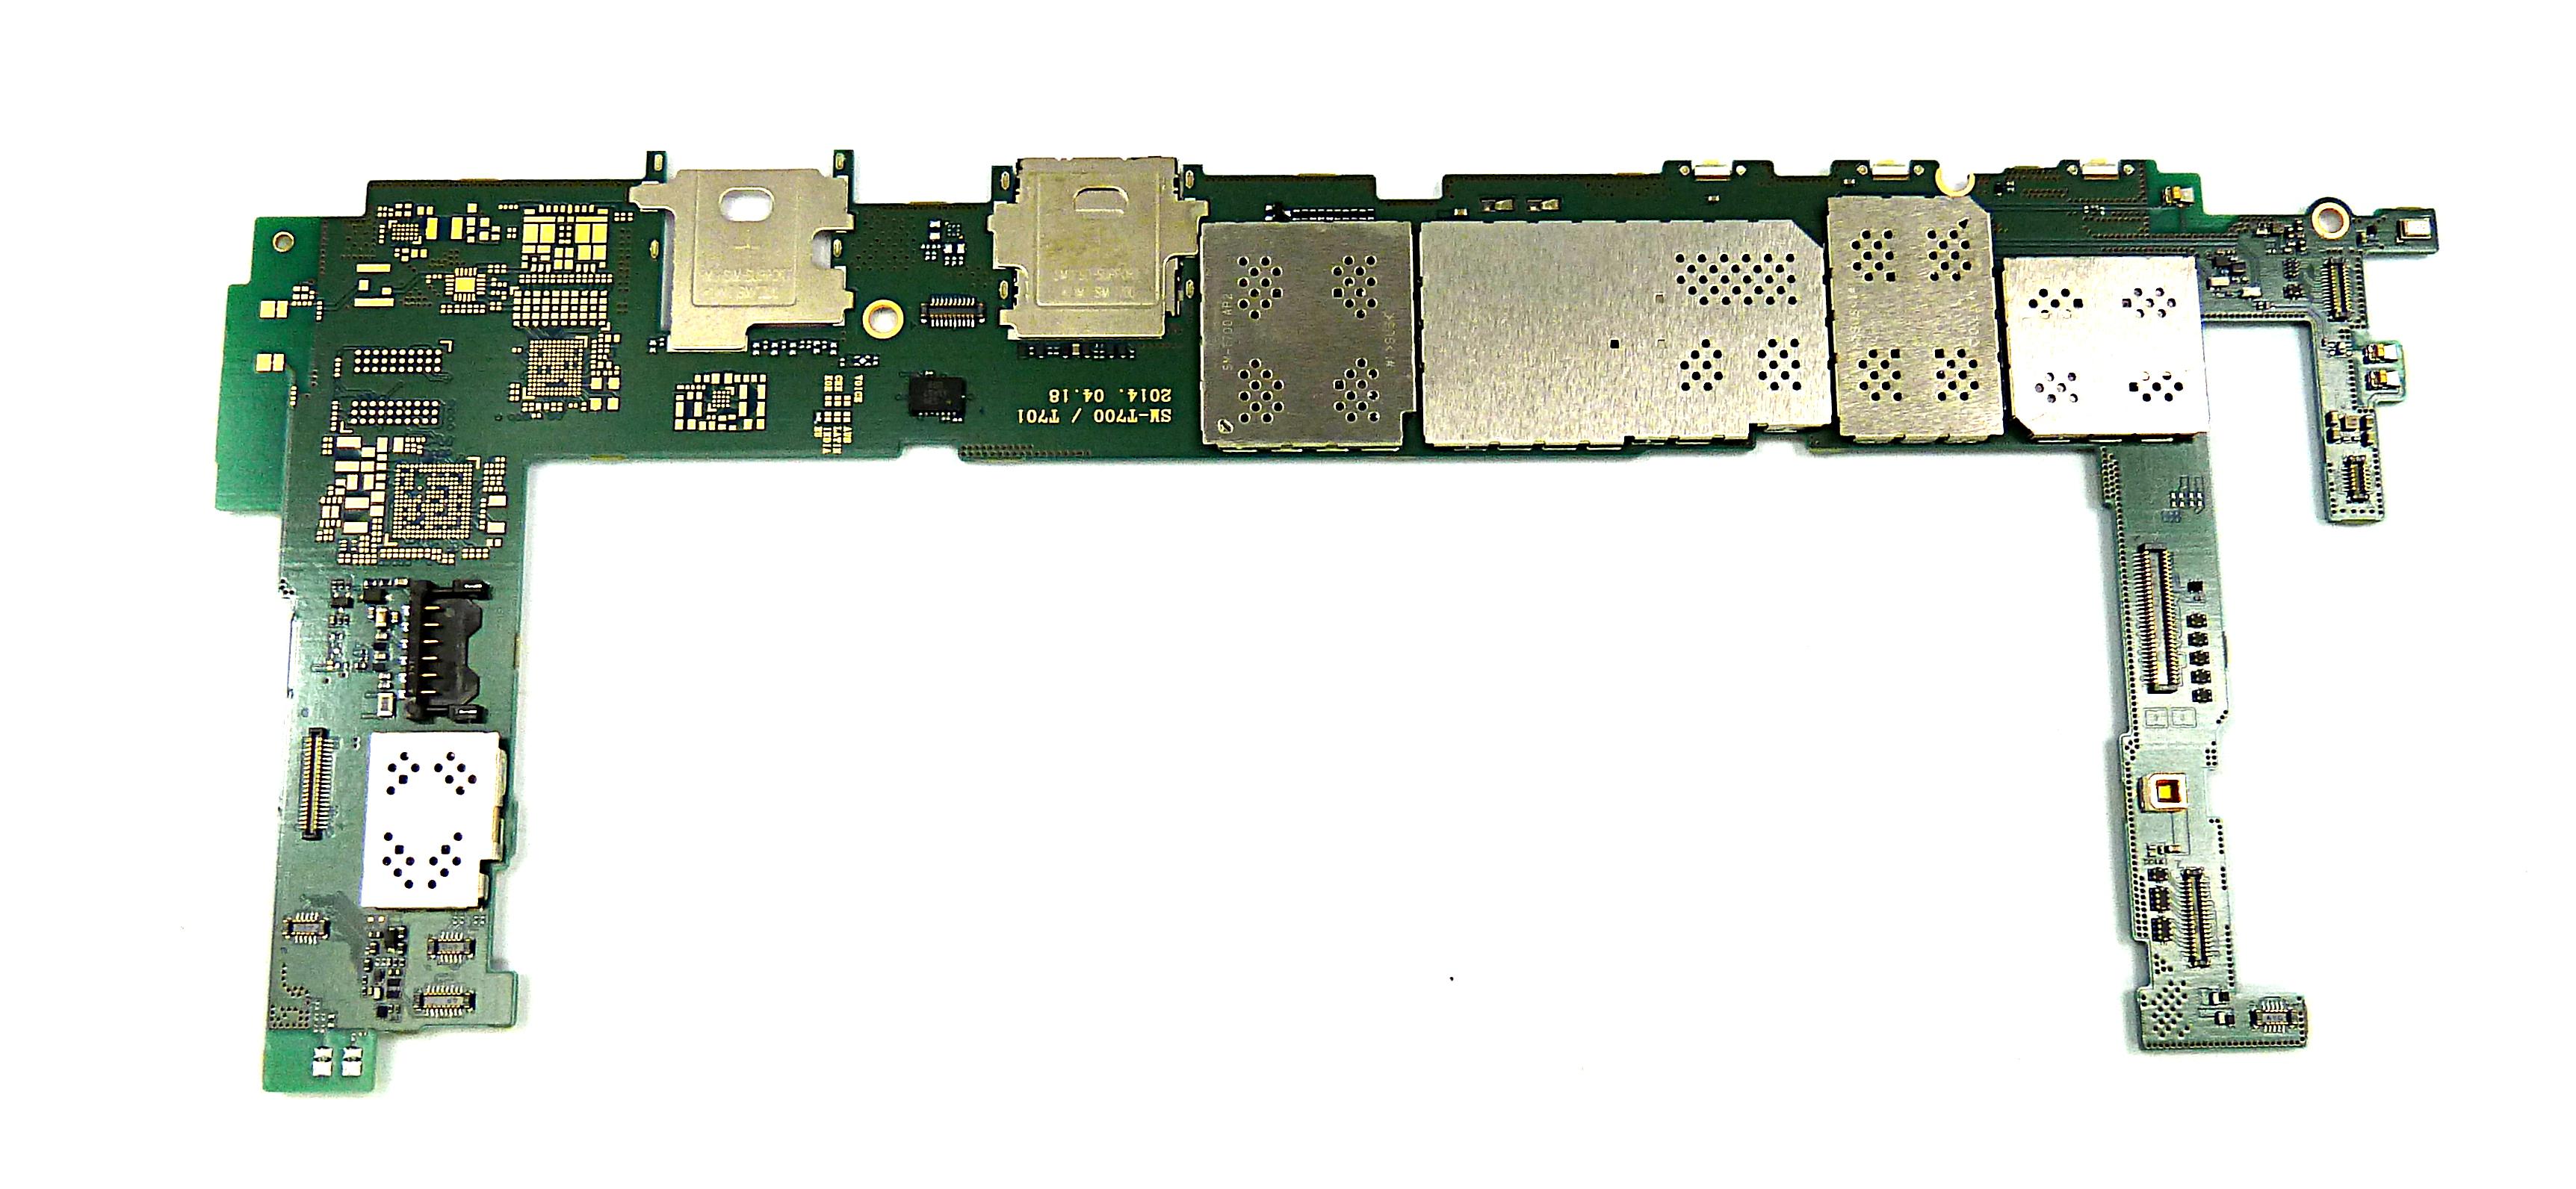 "Samsung Motherboard Main Logic Board /f SM-T700 Galaxy Tab S 8.4"" WiFi 32GB"